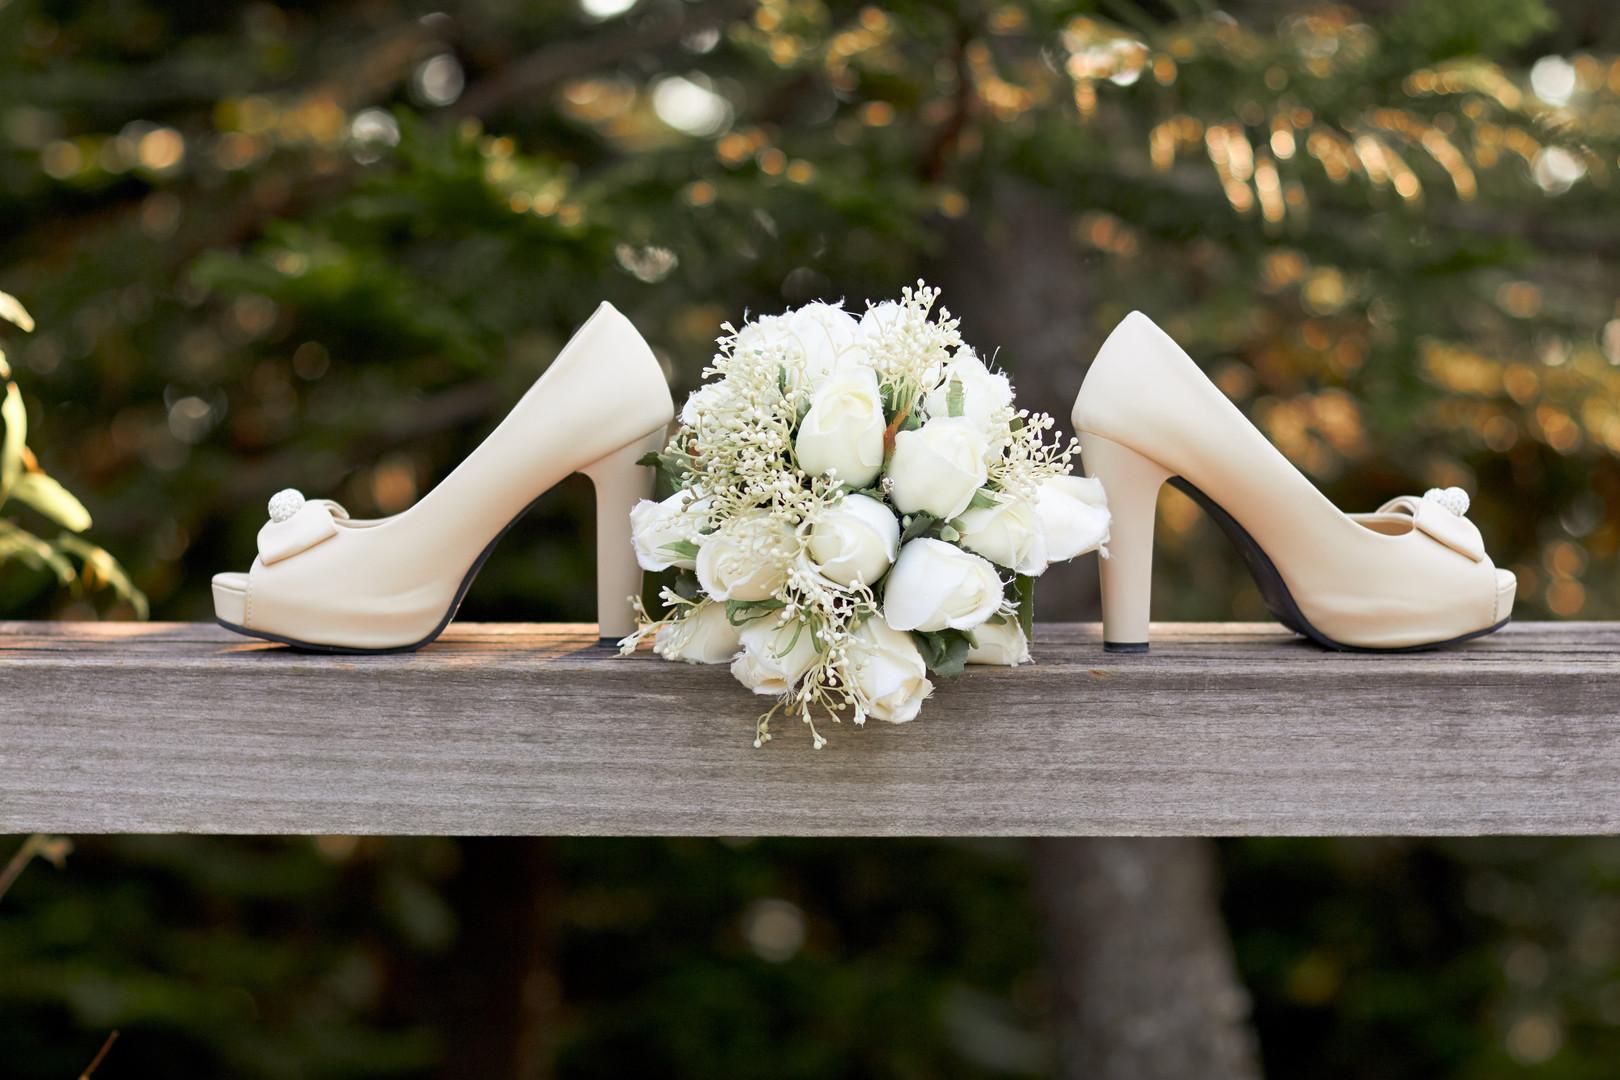 beautiful-bouquet-bride-1445697 (1).jpg